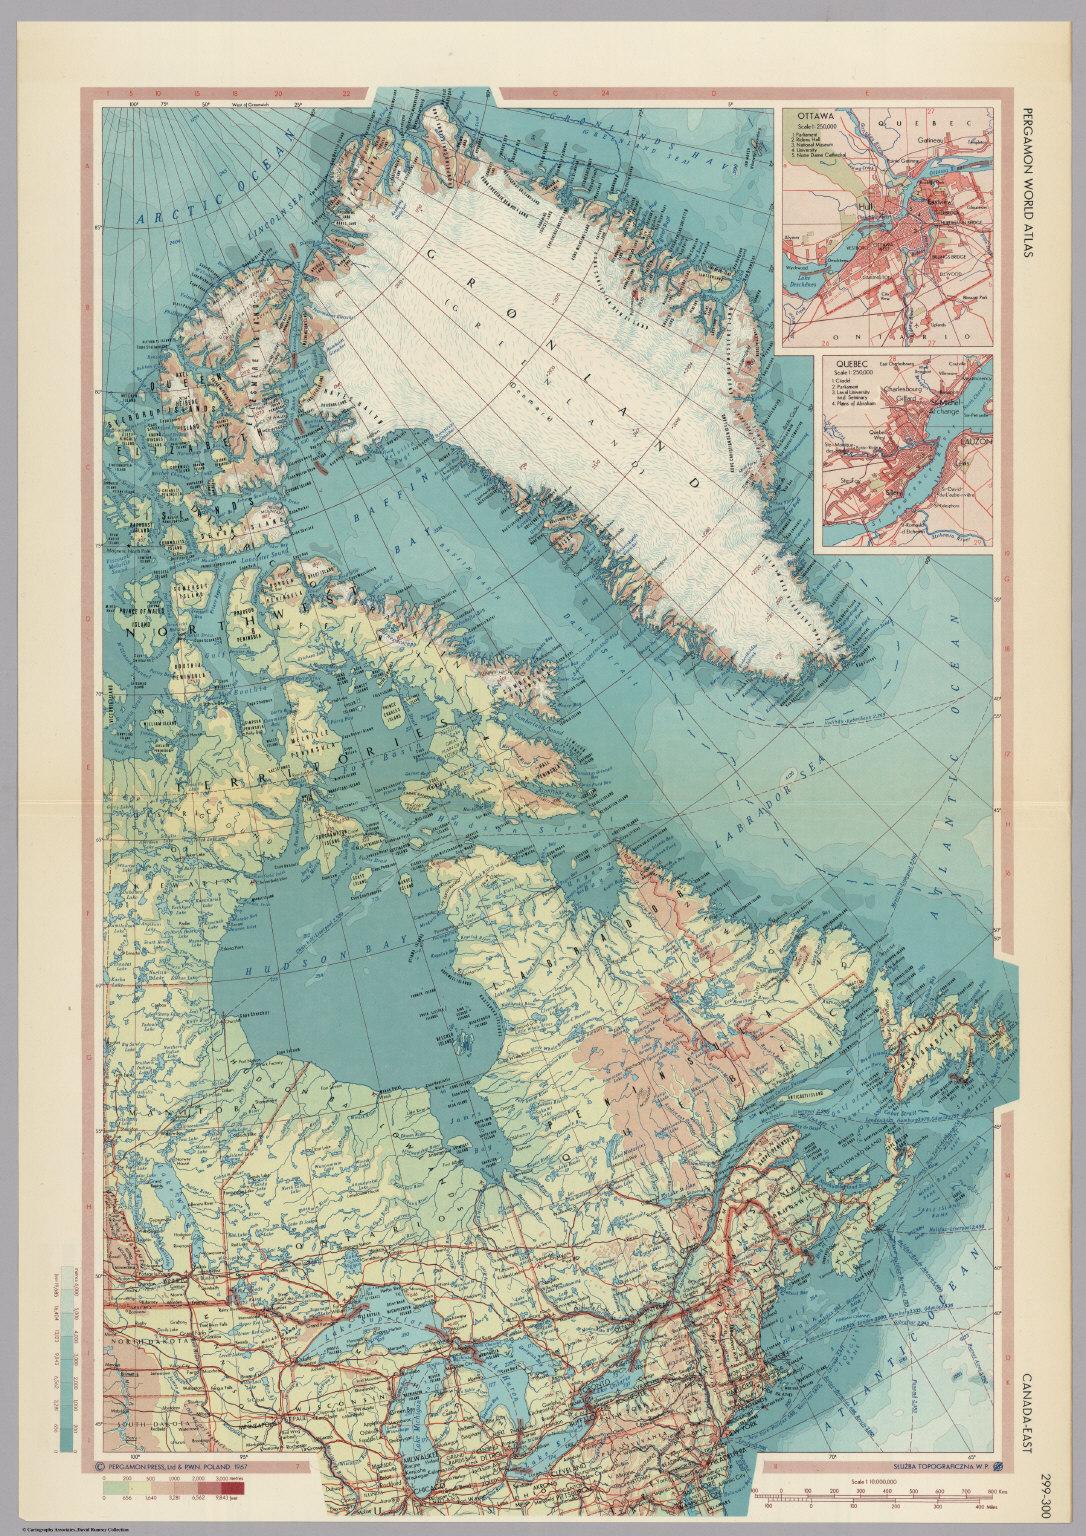 Canada east pergamon world atlas david rumsey historical map pergamon world atlas gumiabroncs Images